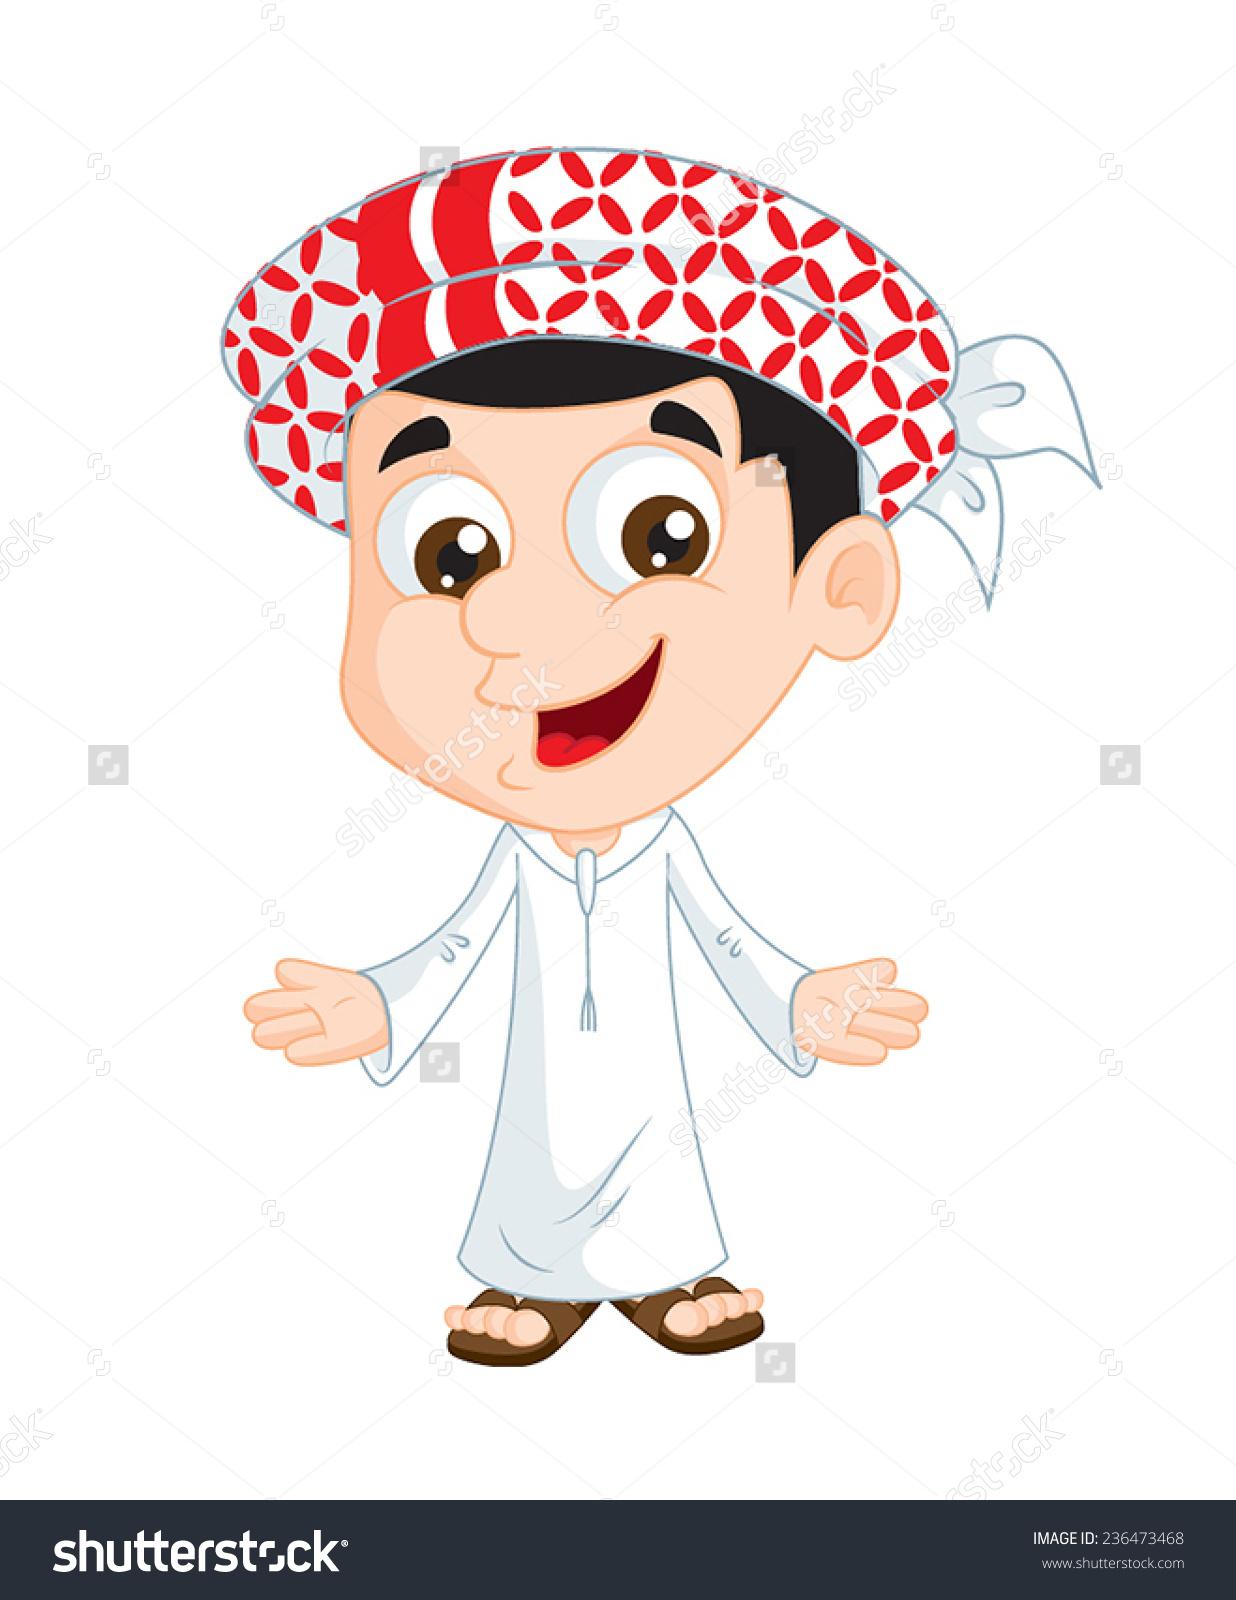 Clipartfest emirati kid illustration. Arabic clipart kids